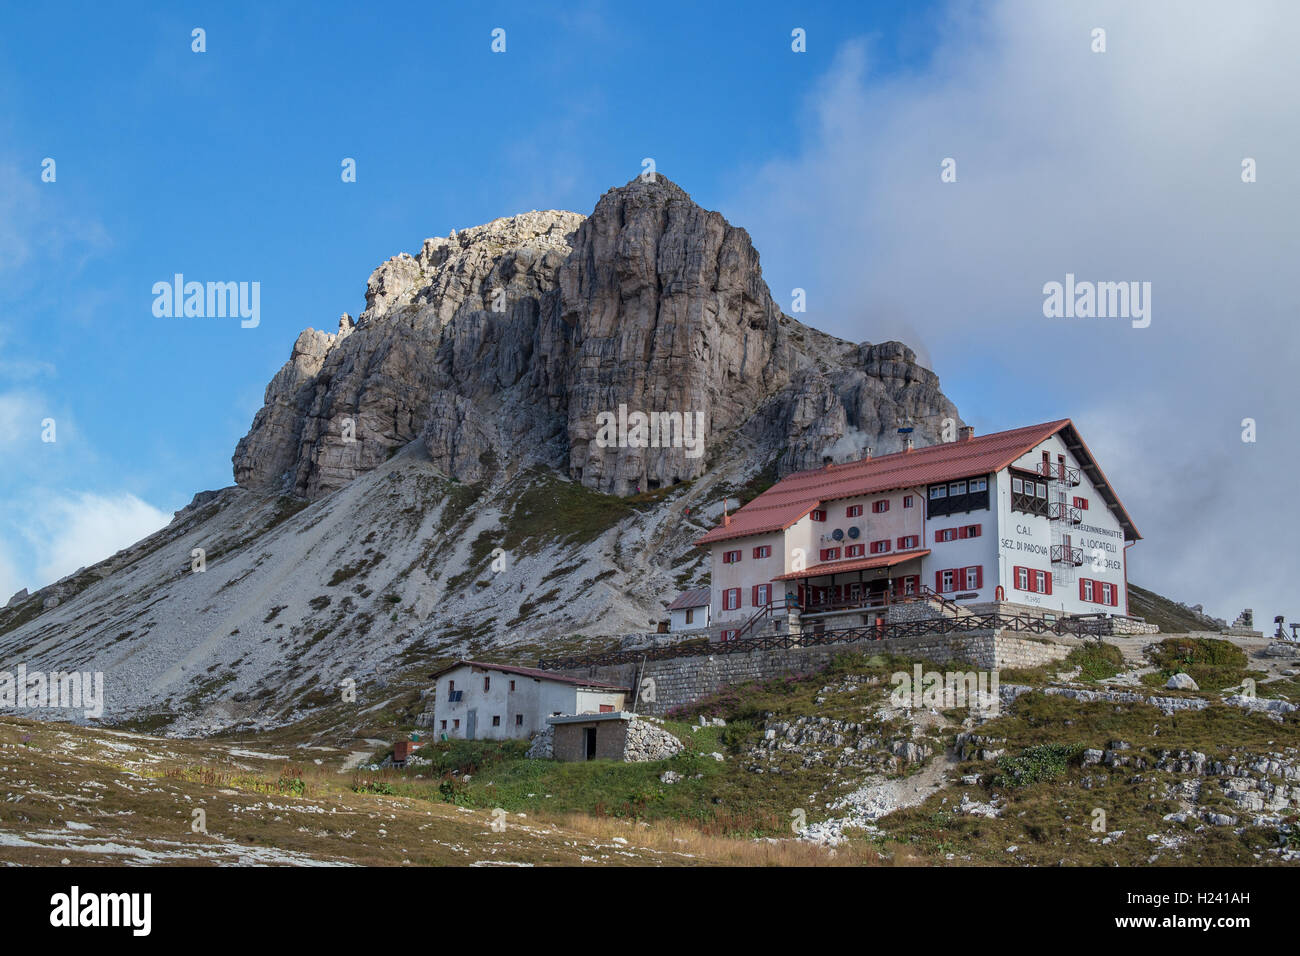 Hut at three peaks / Tre Cime di lavaredo / Drei Zinnen Hütte in the Italian Dolomites - Südtirol / Belluno - Stock Image